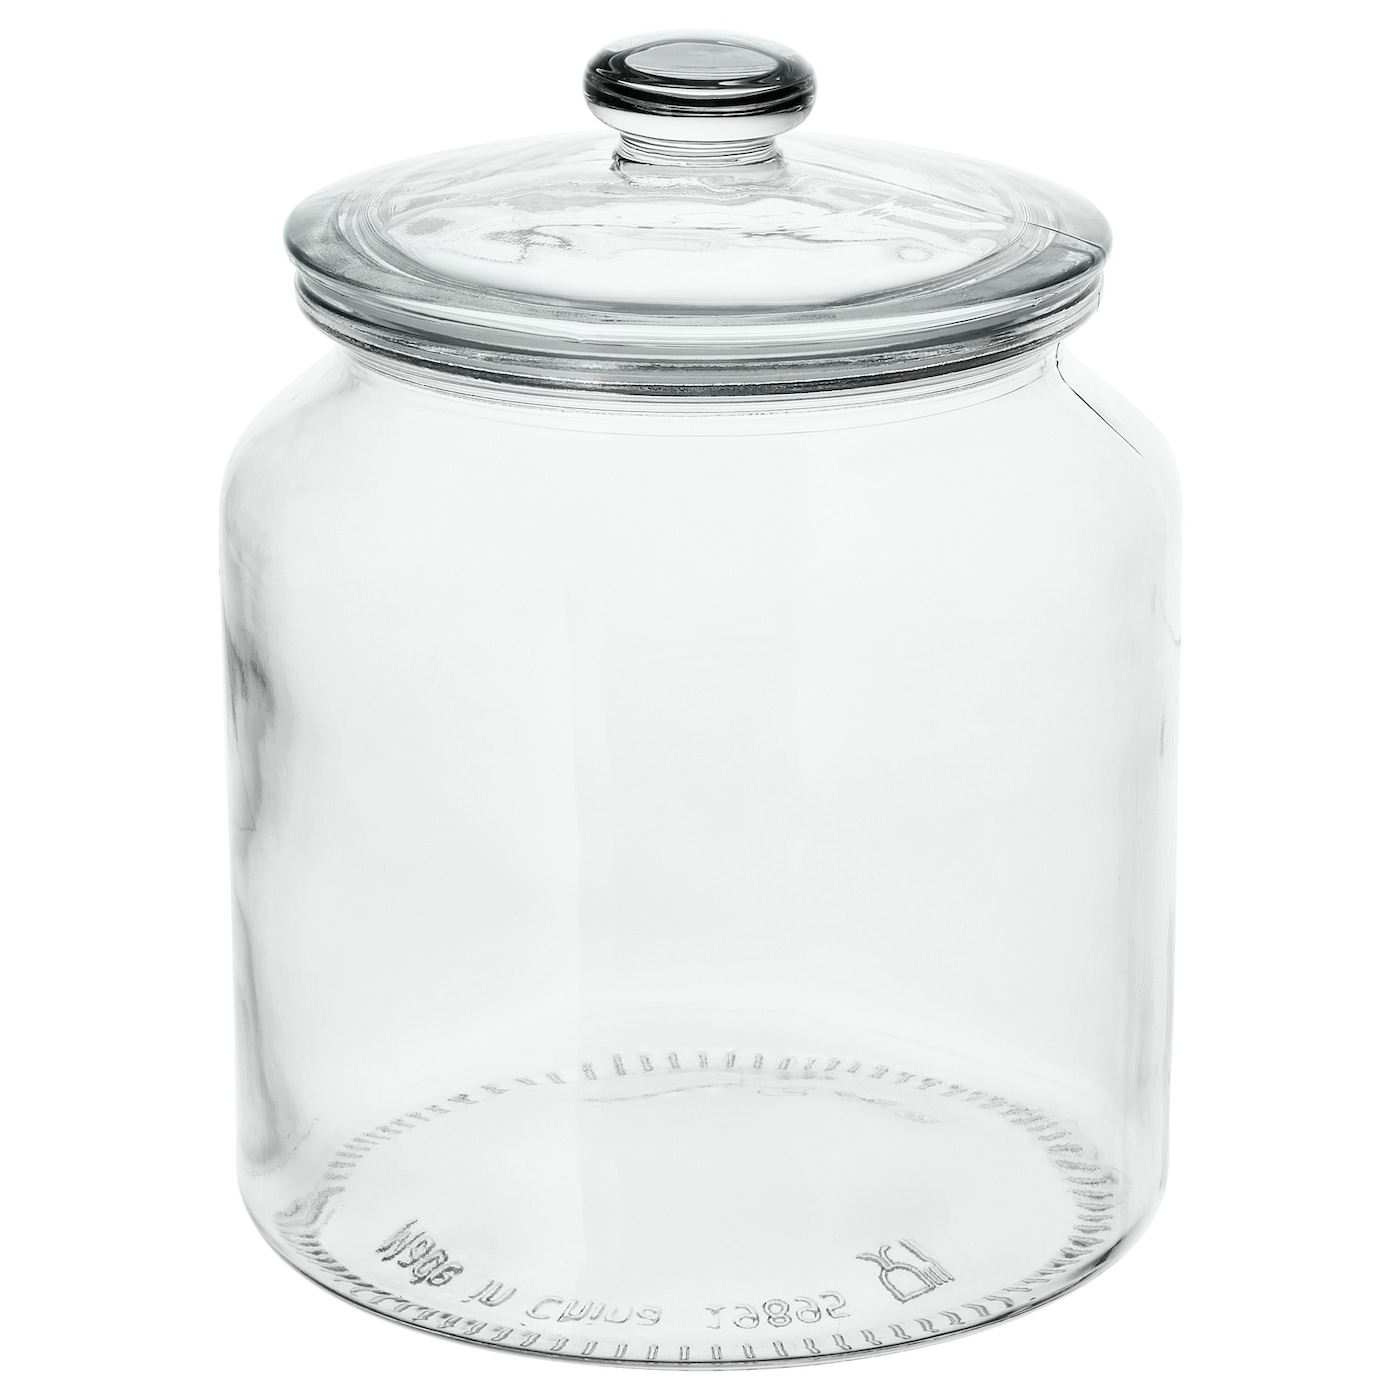 Vardagen Jar With Lid Clear Glass Height 7 Diameter 5 Ikea